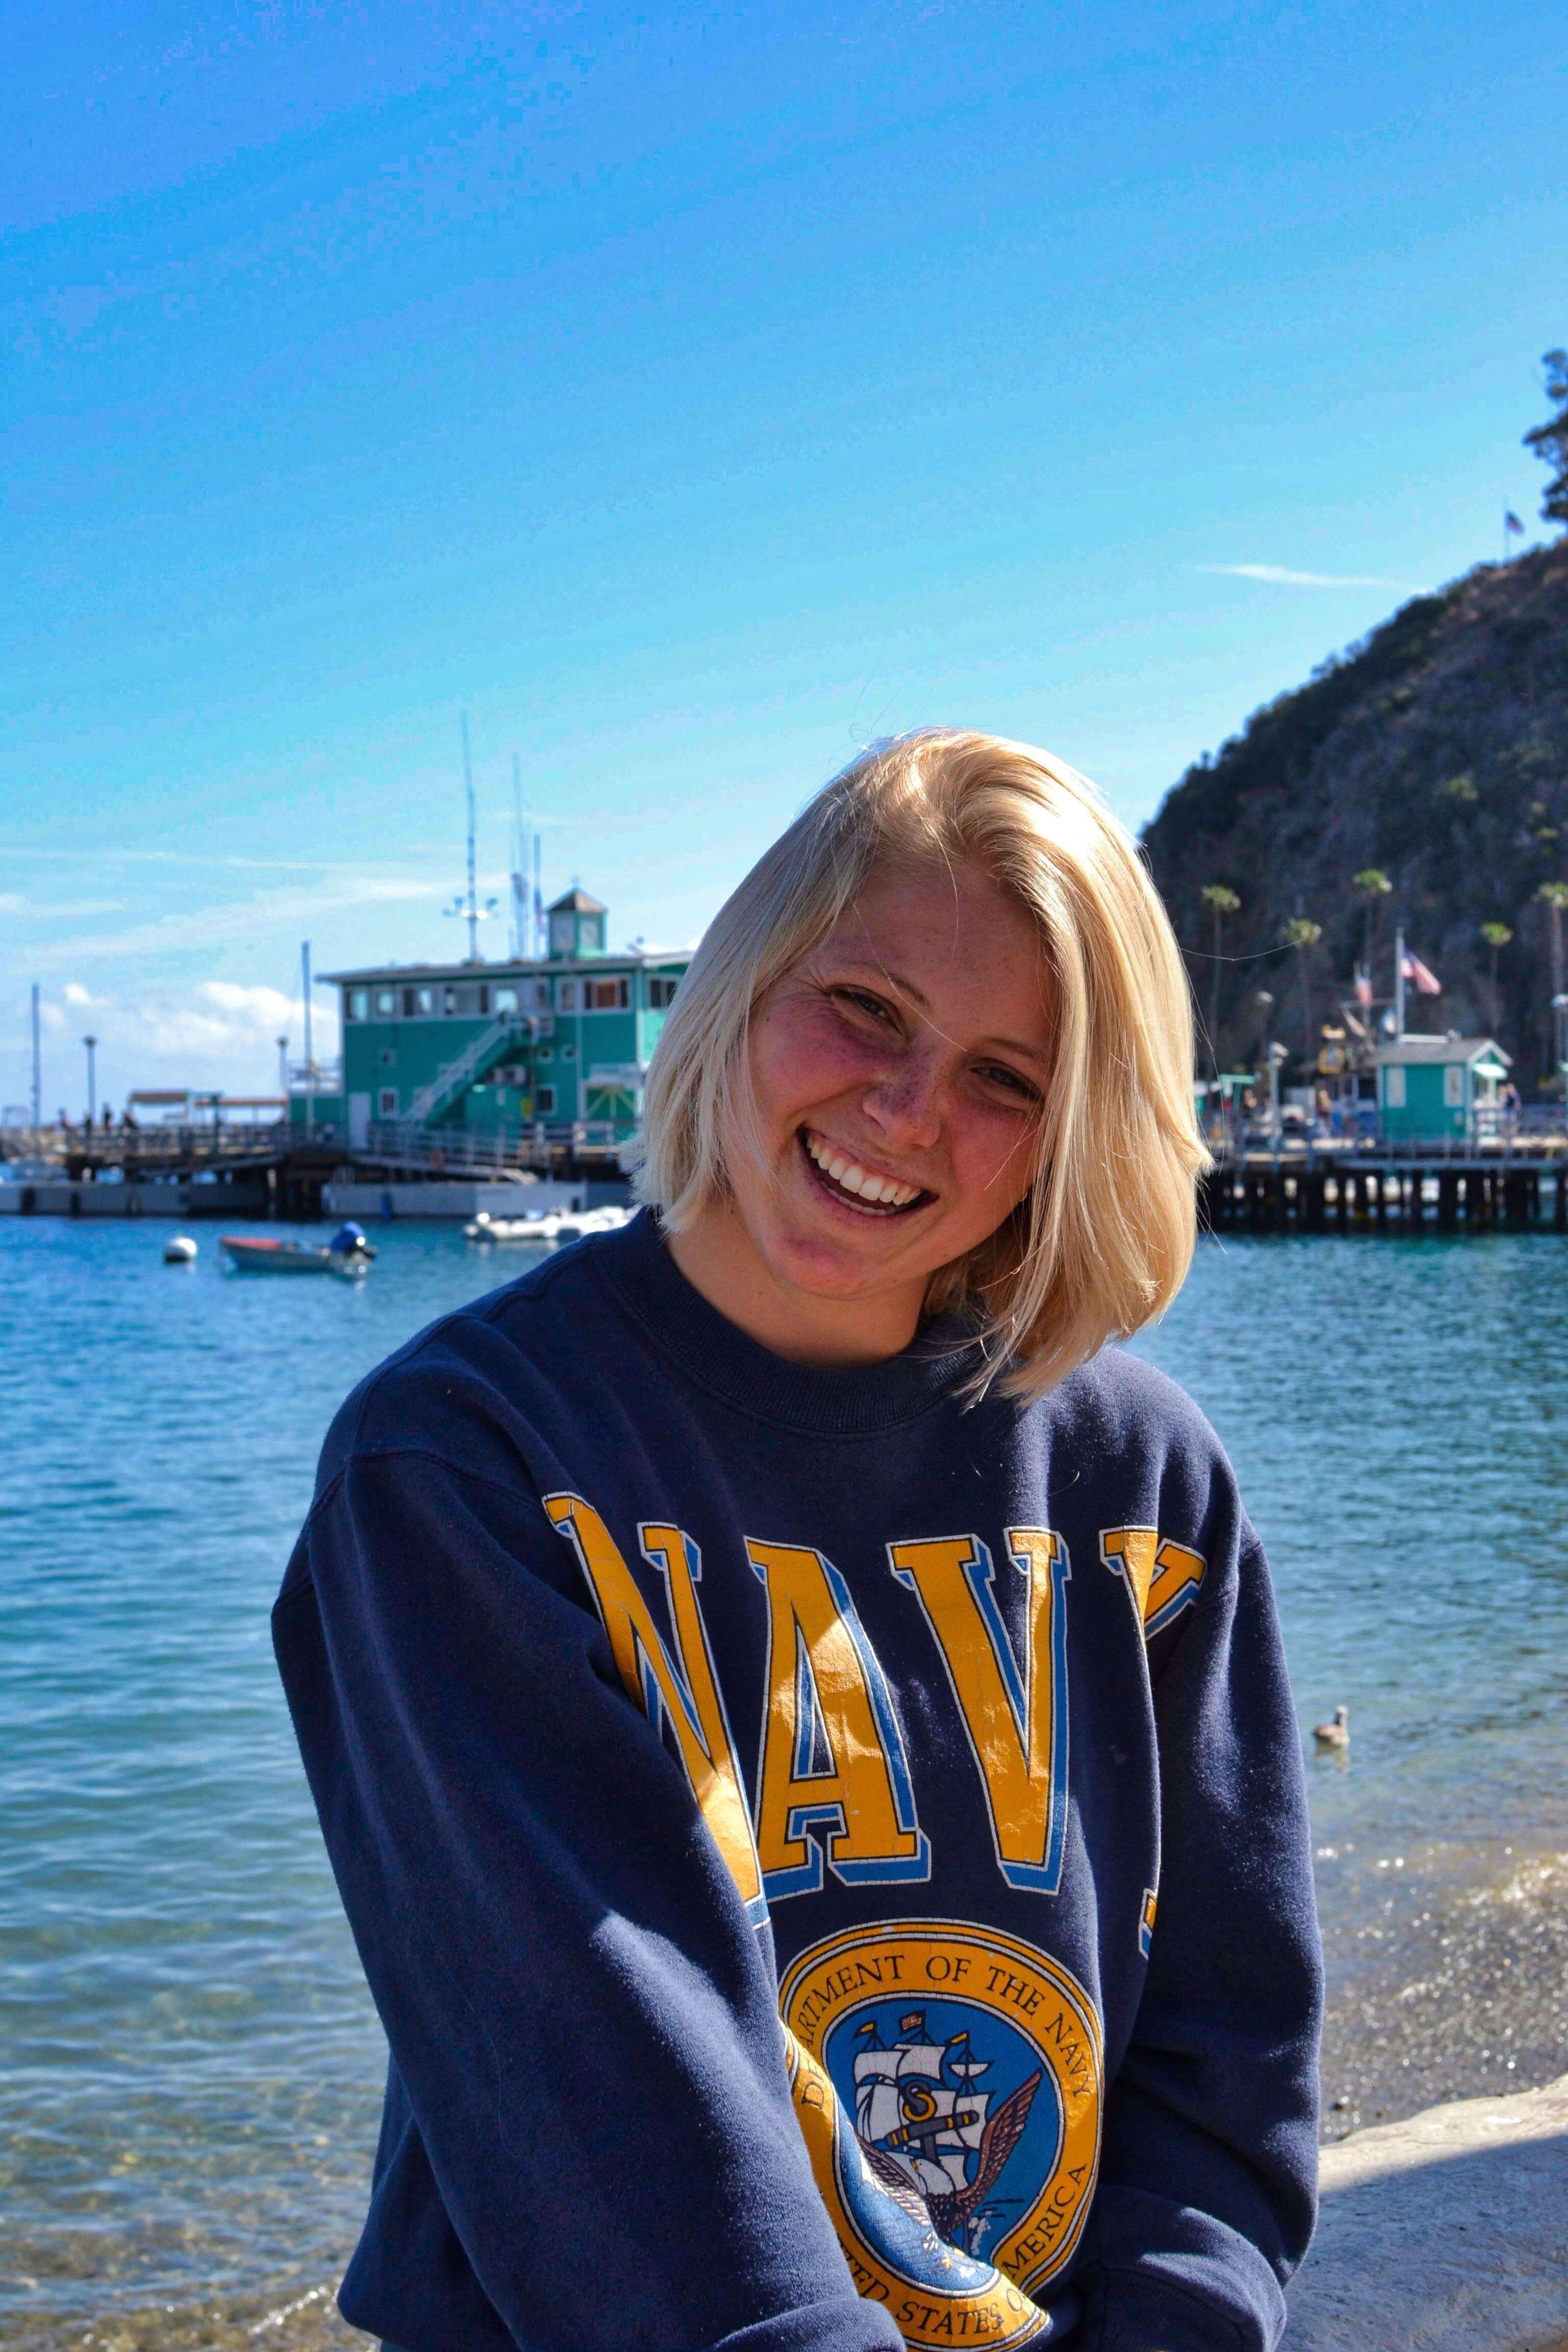 Sunsational Private Swim Lesson Instructor in Denver - Paige H